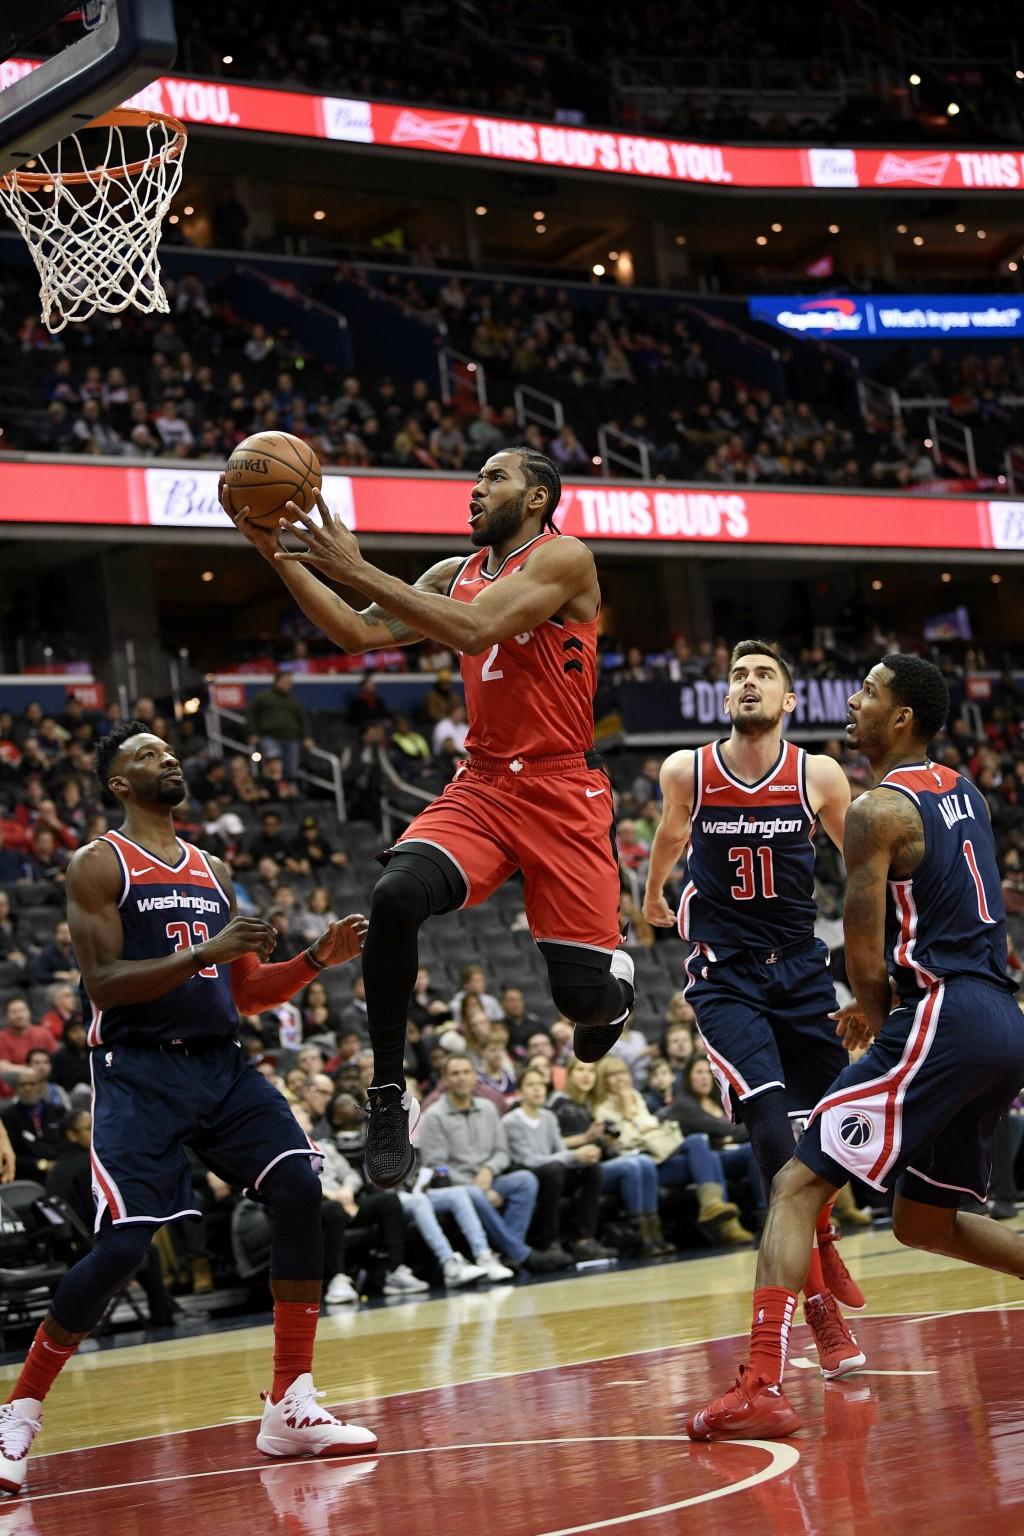 Toronto Raptors forward Kawhi Leonard (2) goes to the basket against Washington Wizards forward Jeff Green (32), guard Tomas Satoransky (31), of the C